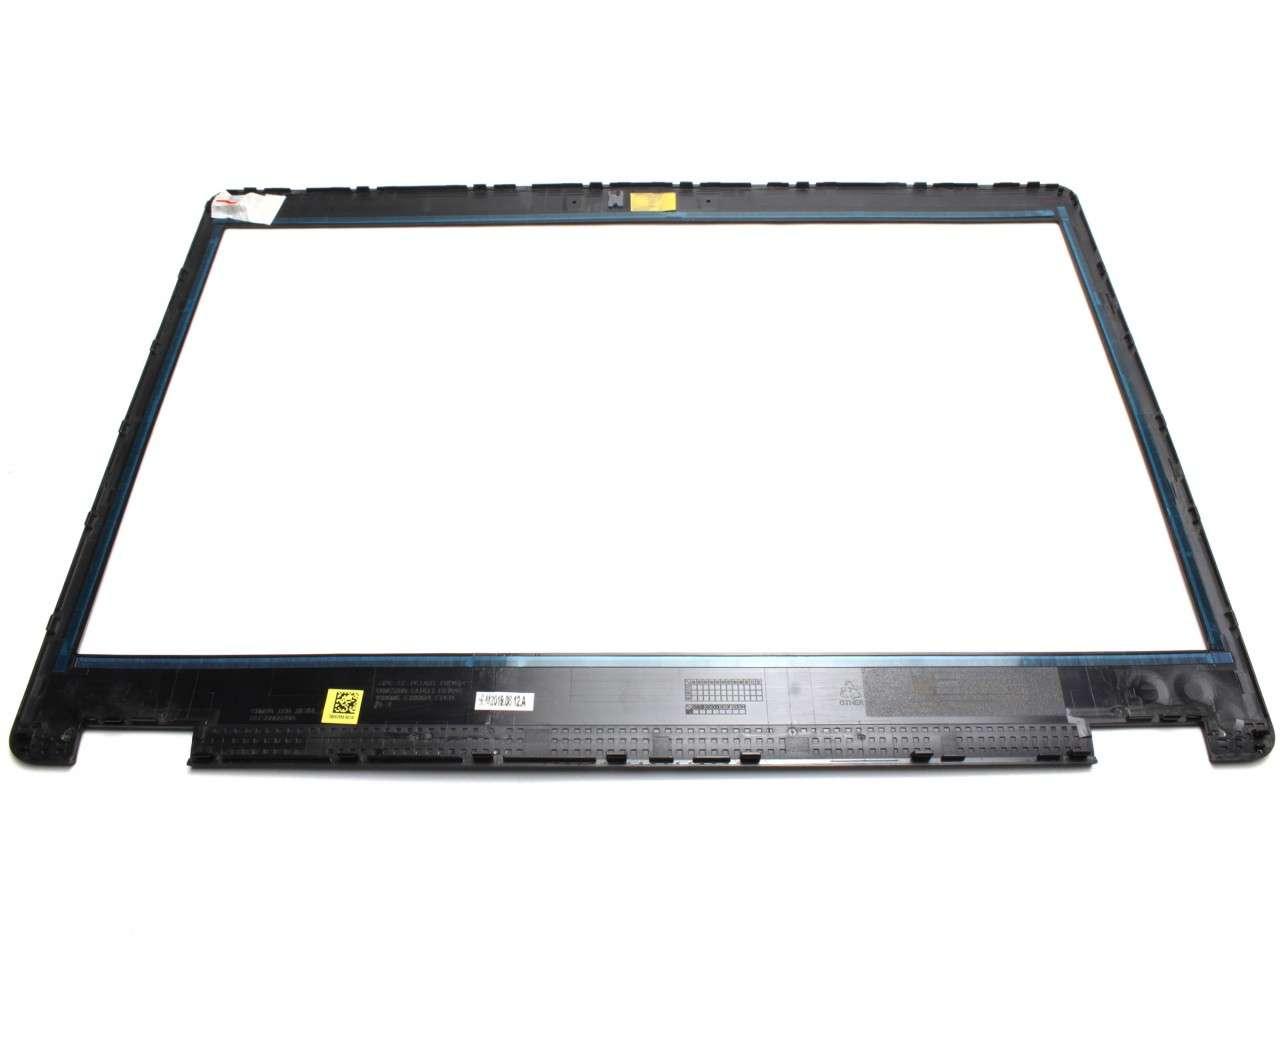 Rama Display Dell 0CYJ3R Bezel Front Cover Neagra imagine powerlaptop.ro 2021